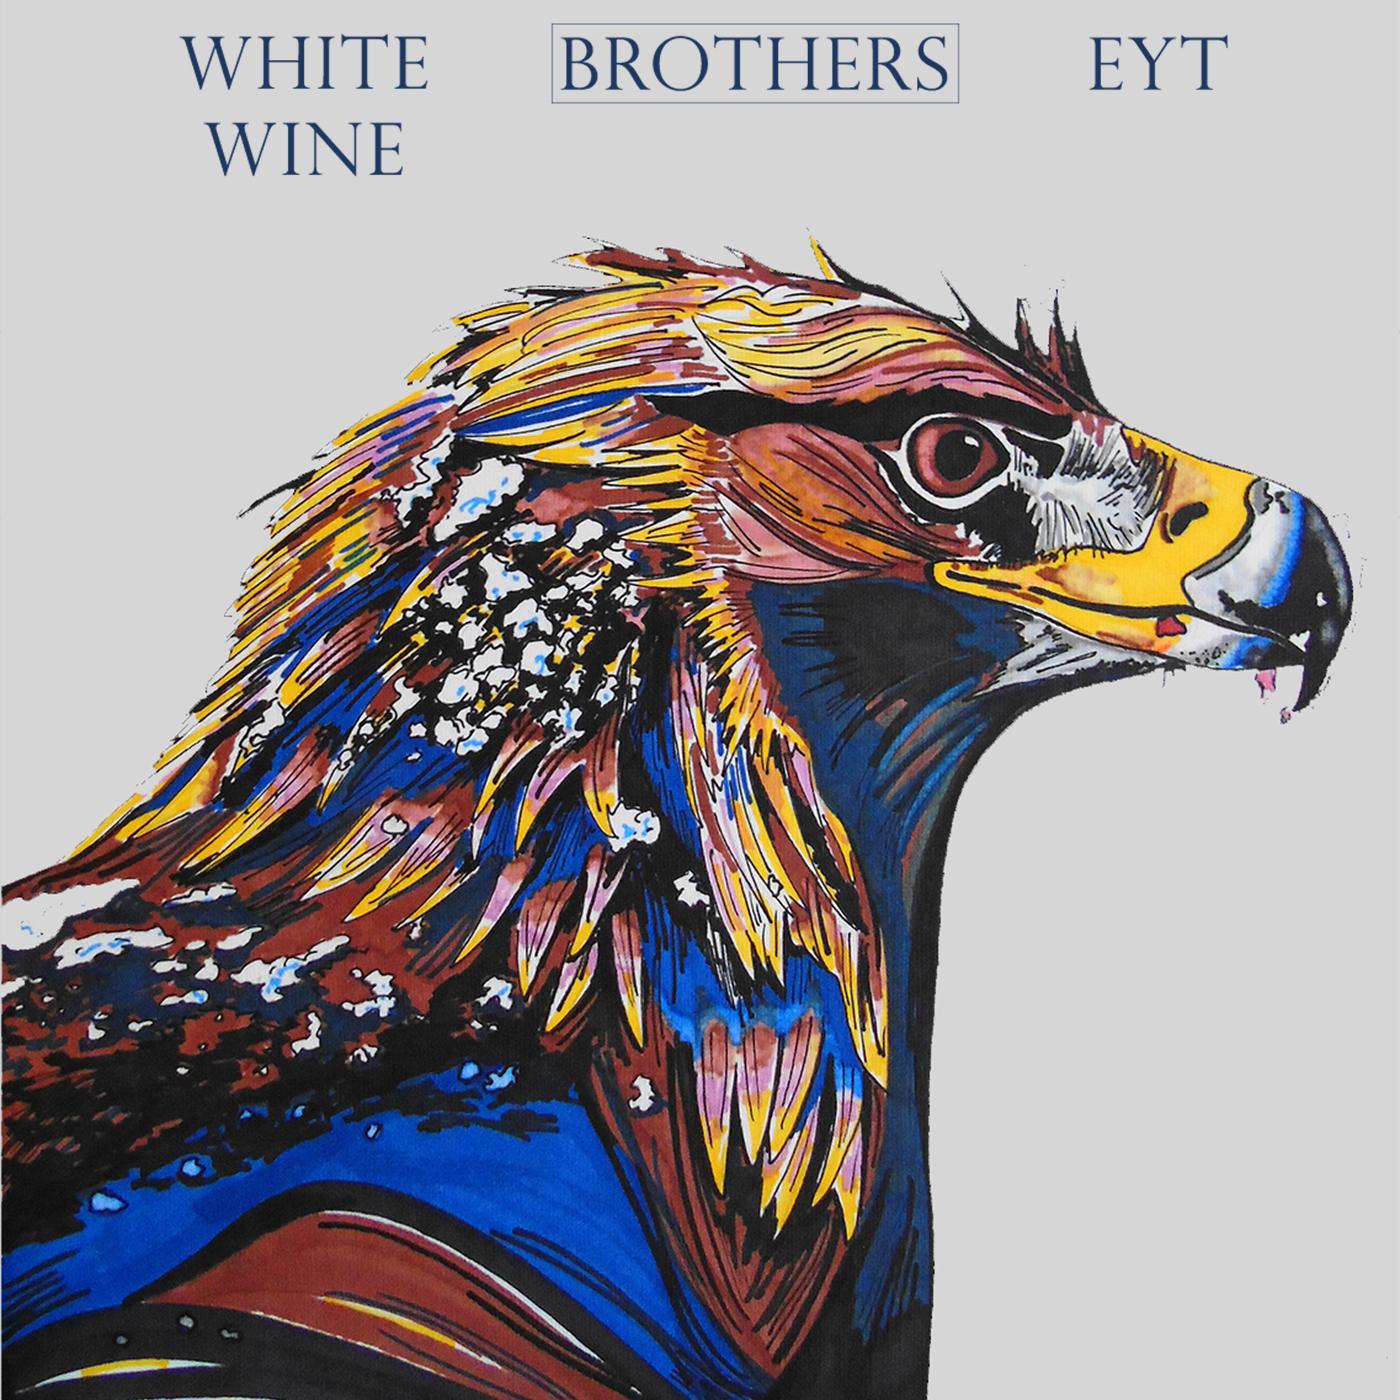 Brothers - 'White Wine' & 'EYT'